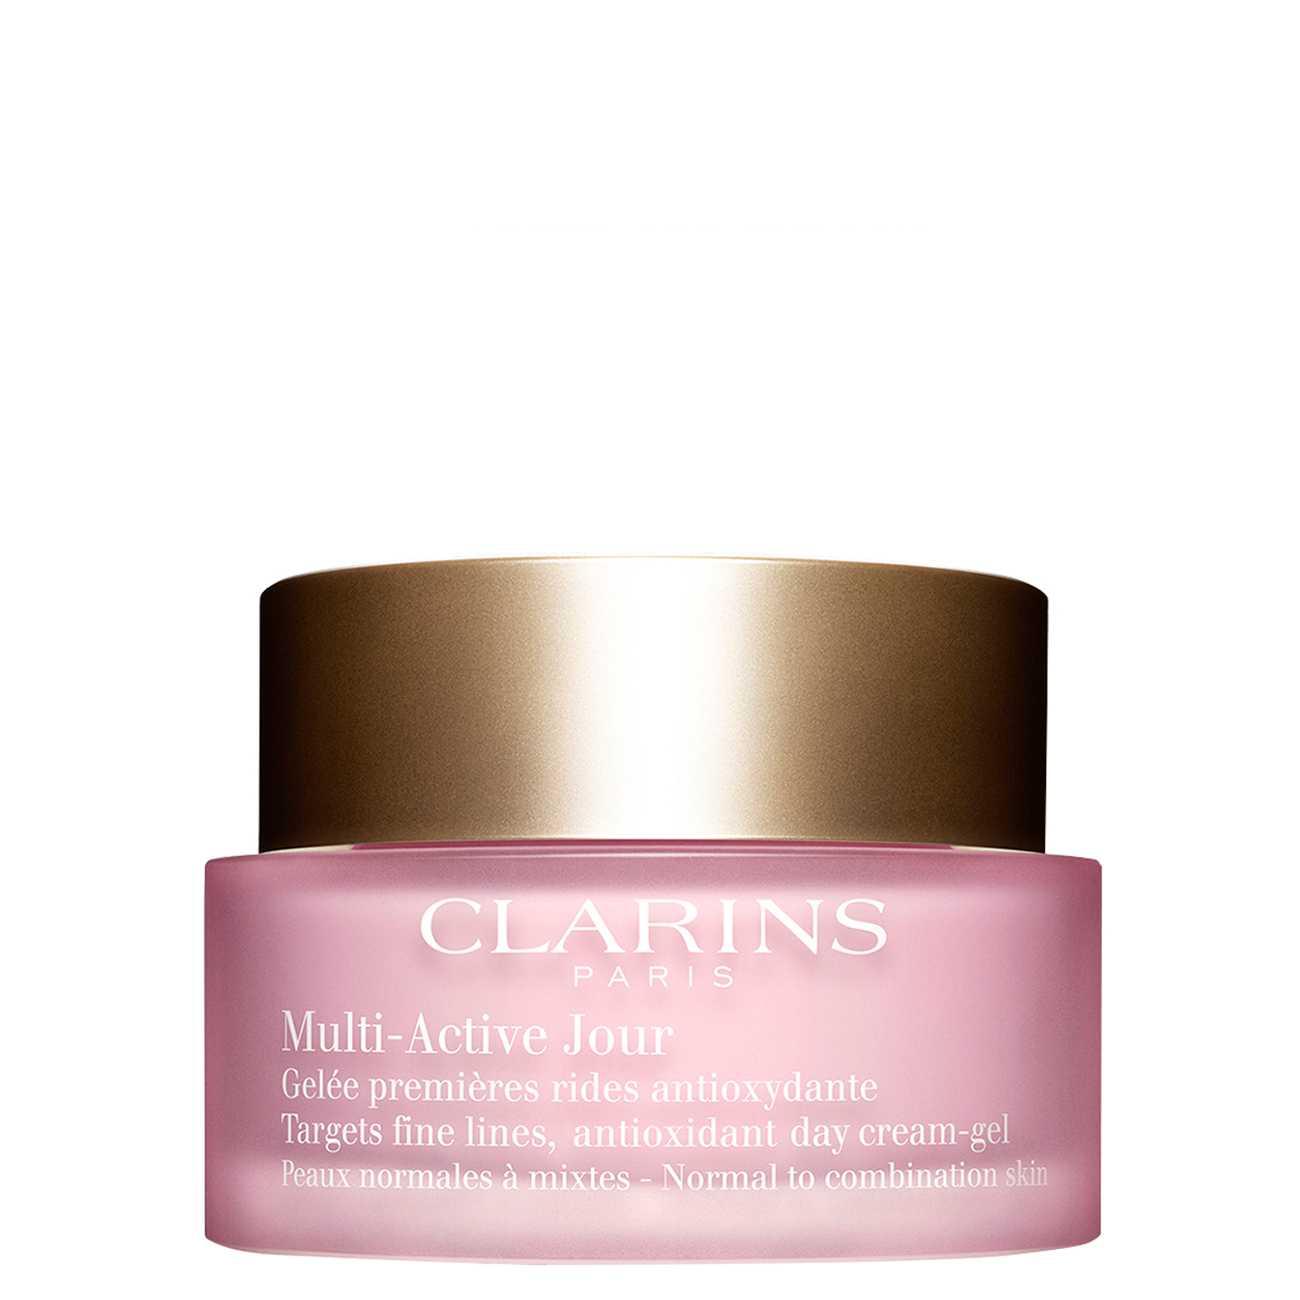 Multi Active Day Cream Gel 50 Ml Clarins imagine 2021 bestvalue.eu